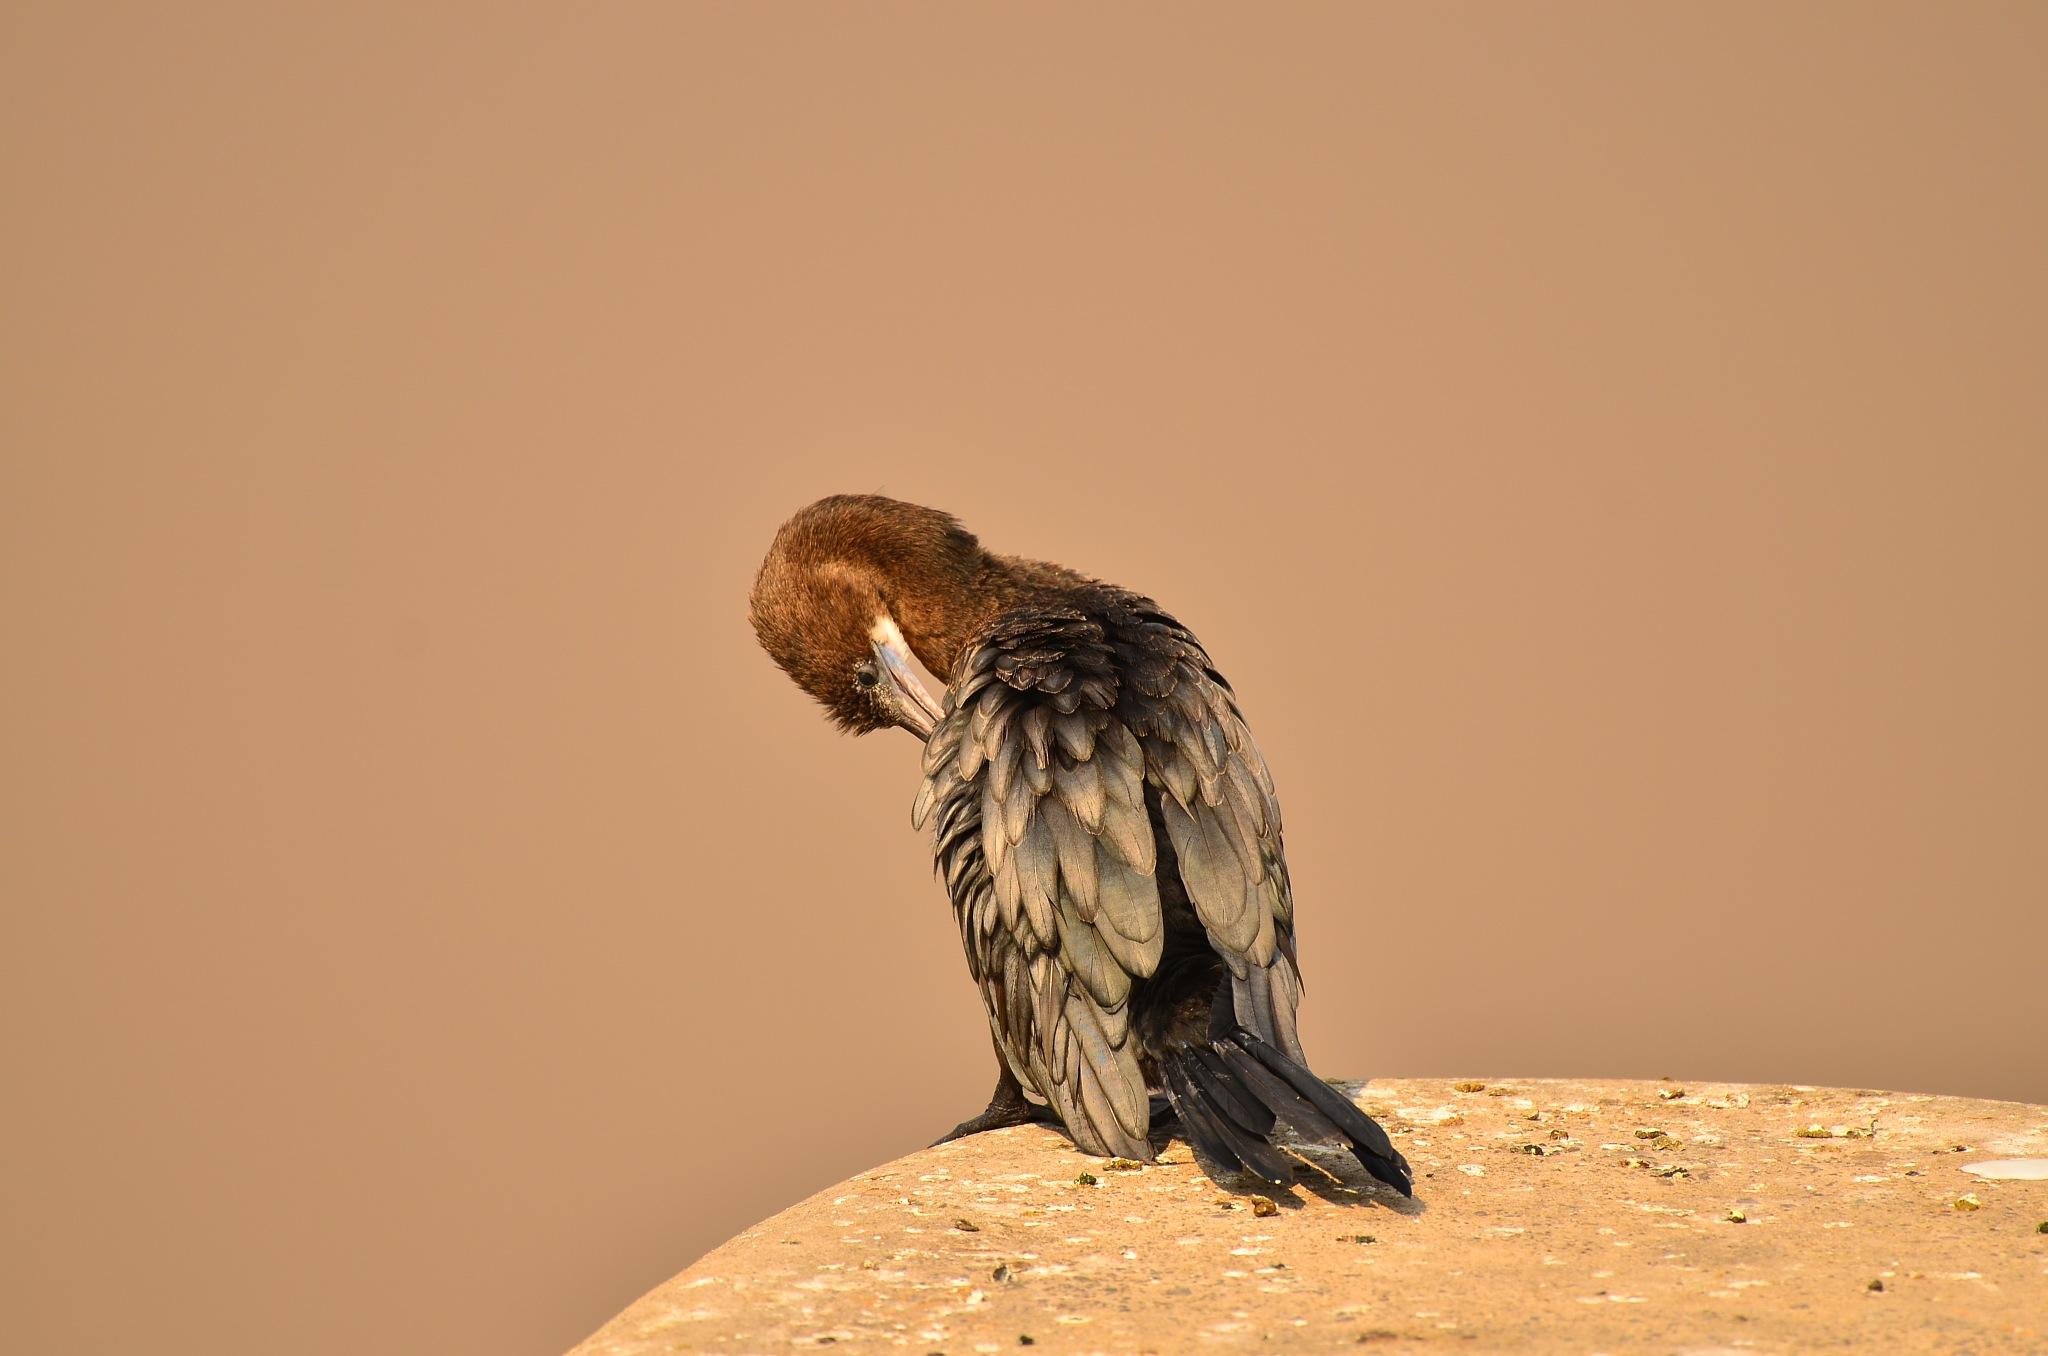 water crow by Yugam Kaka